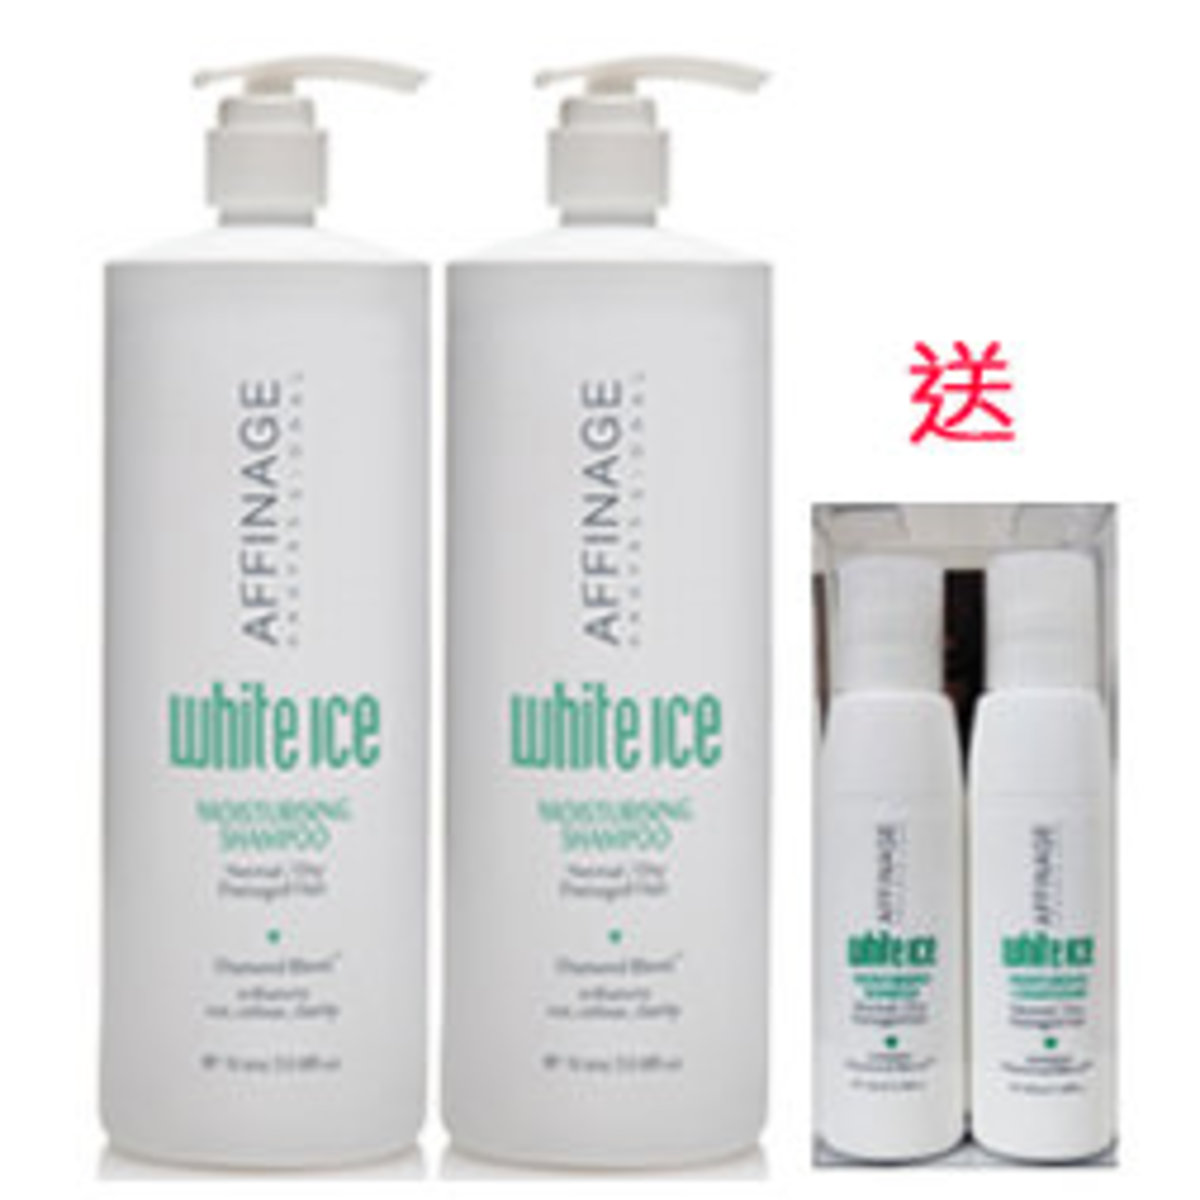 White Ice Moist Shampoo & Conditioner 1000ml Free 100ml Trial Size One Set